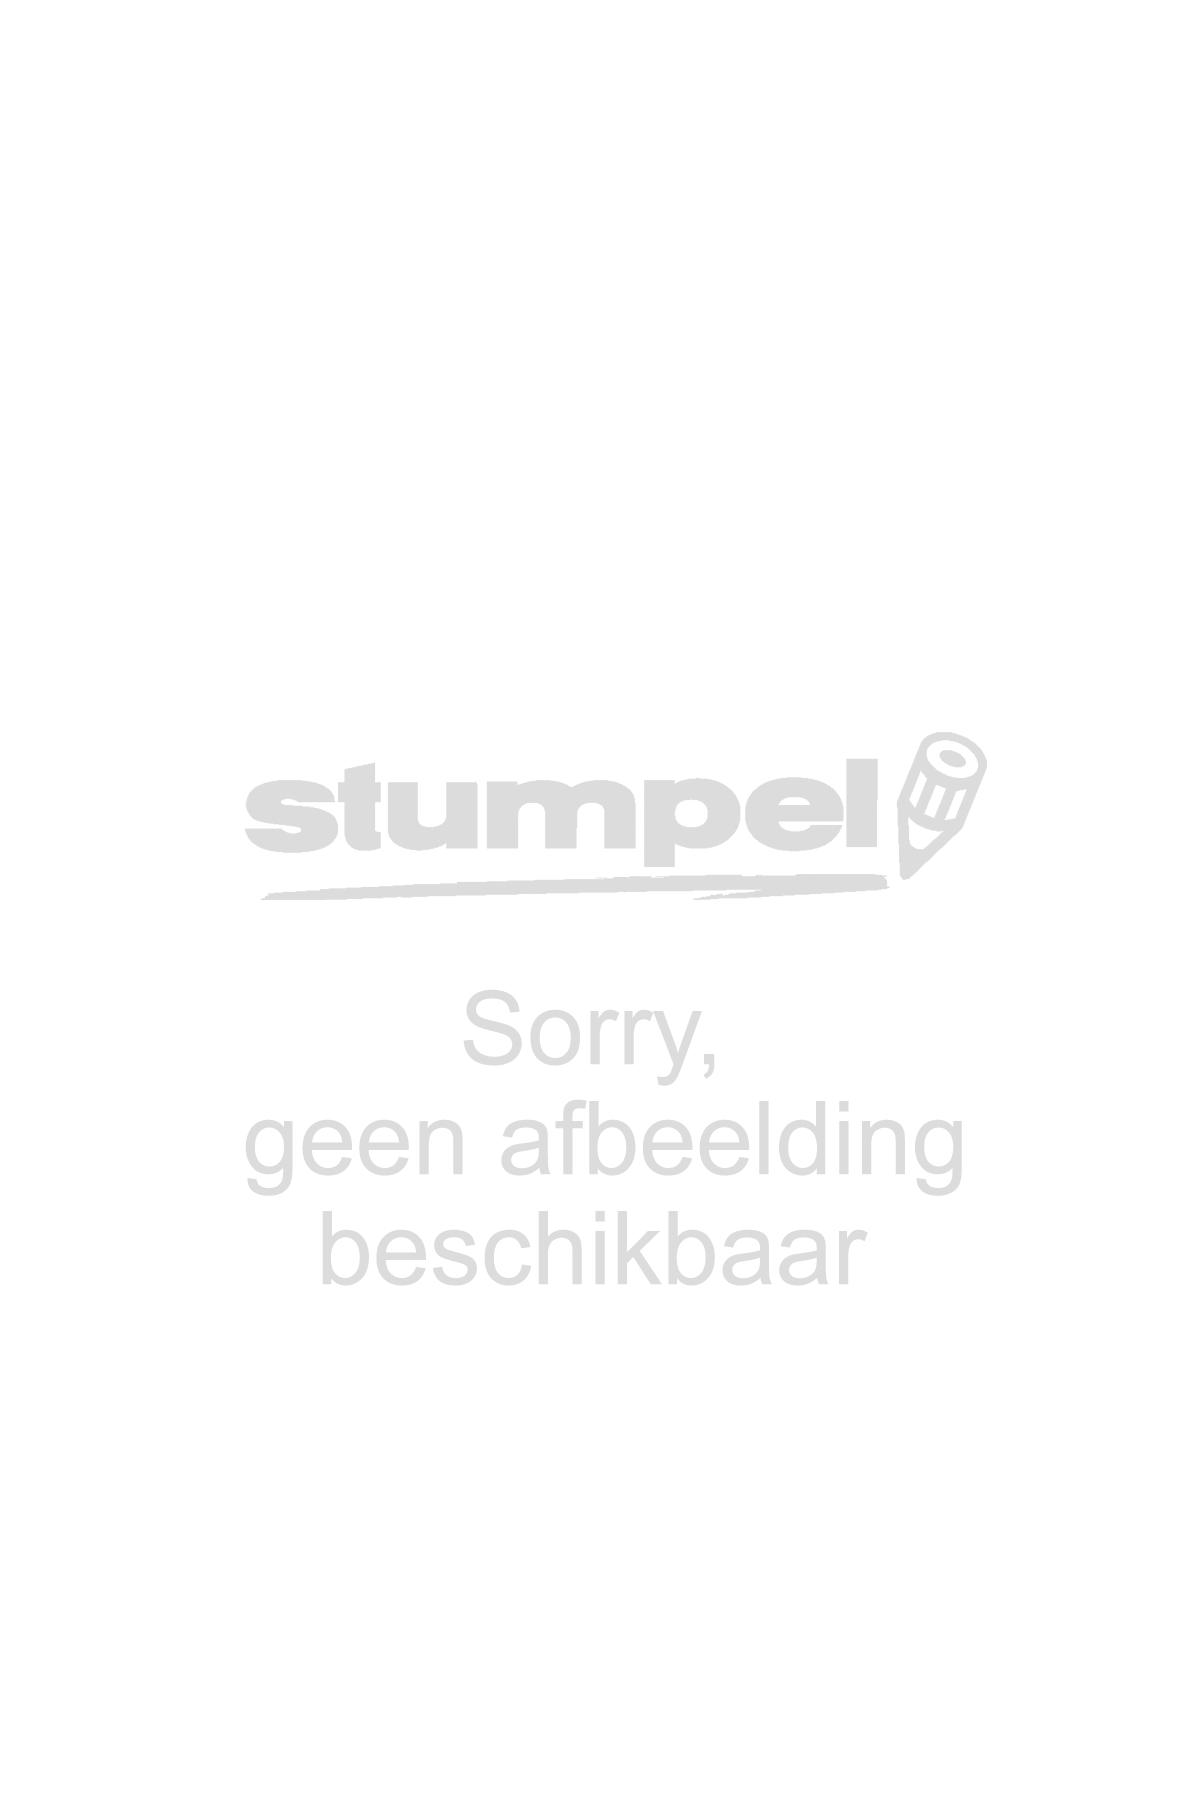 viltstift-edding-780-lakmarker-rond-koper-0-8mm-10083965